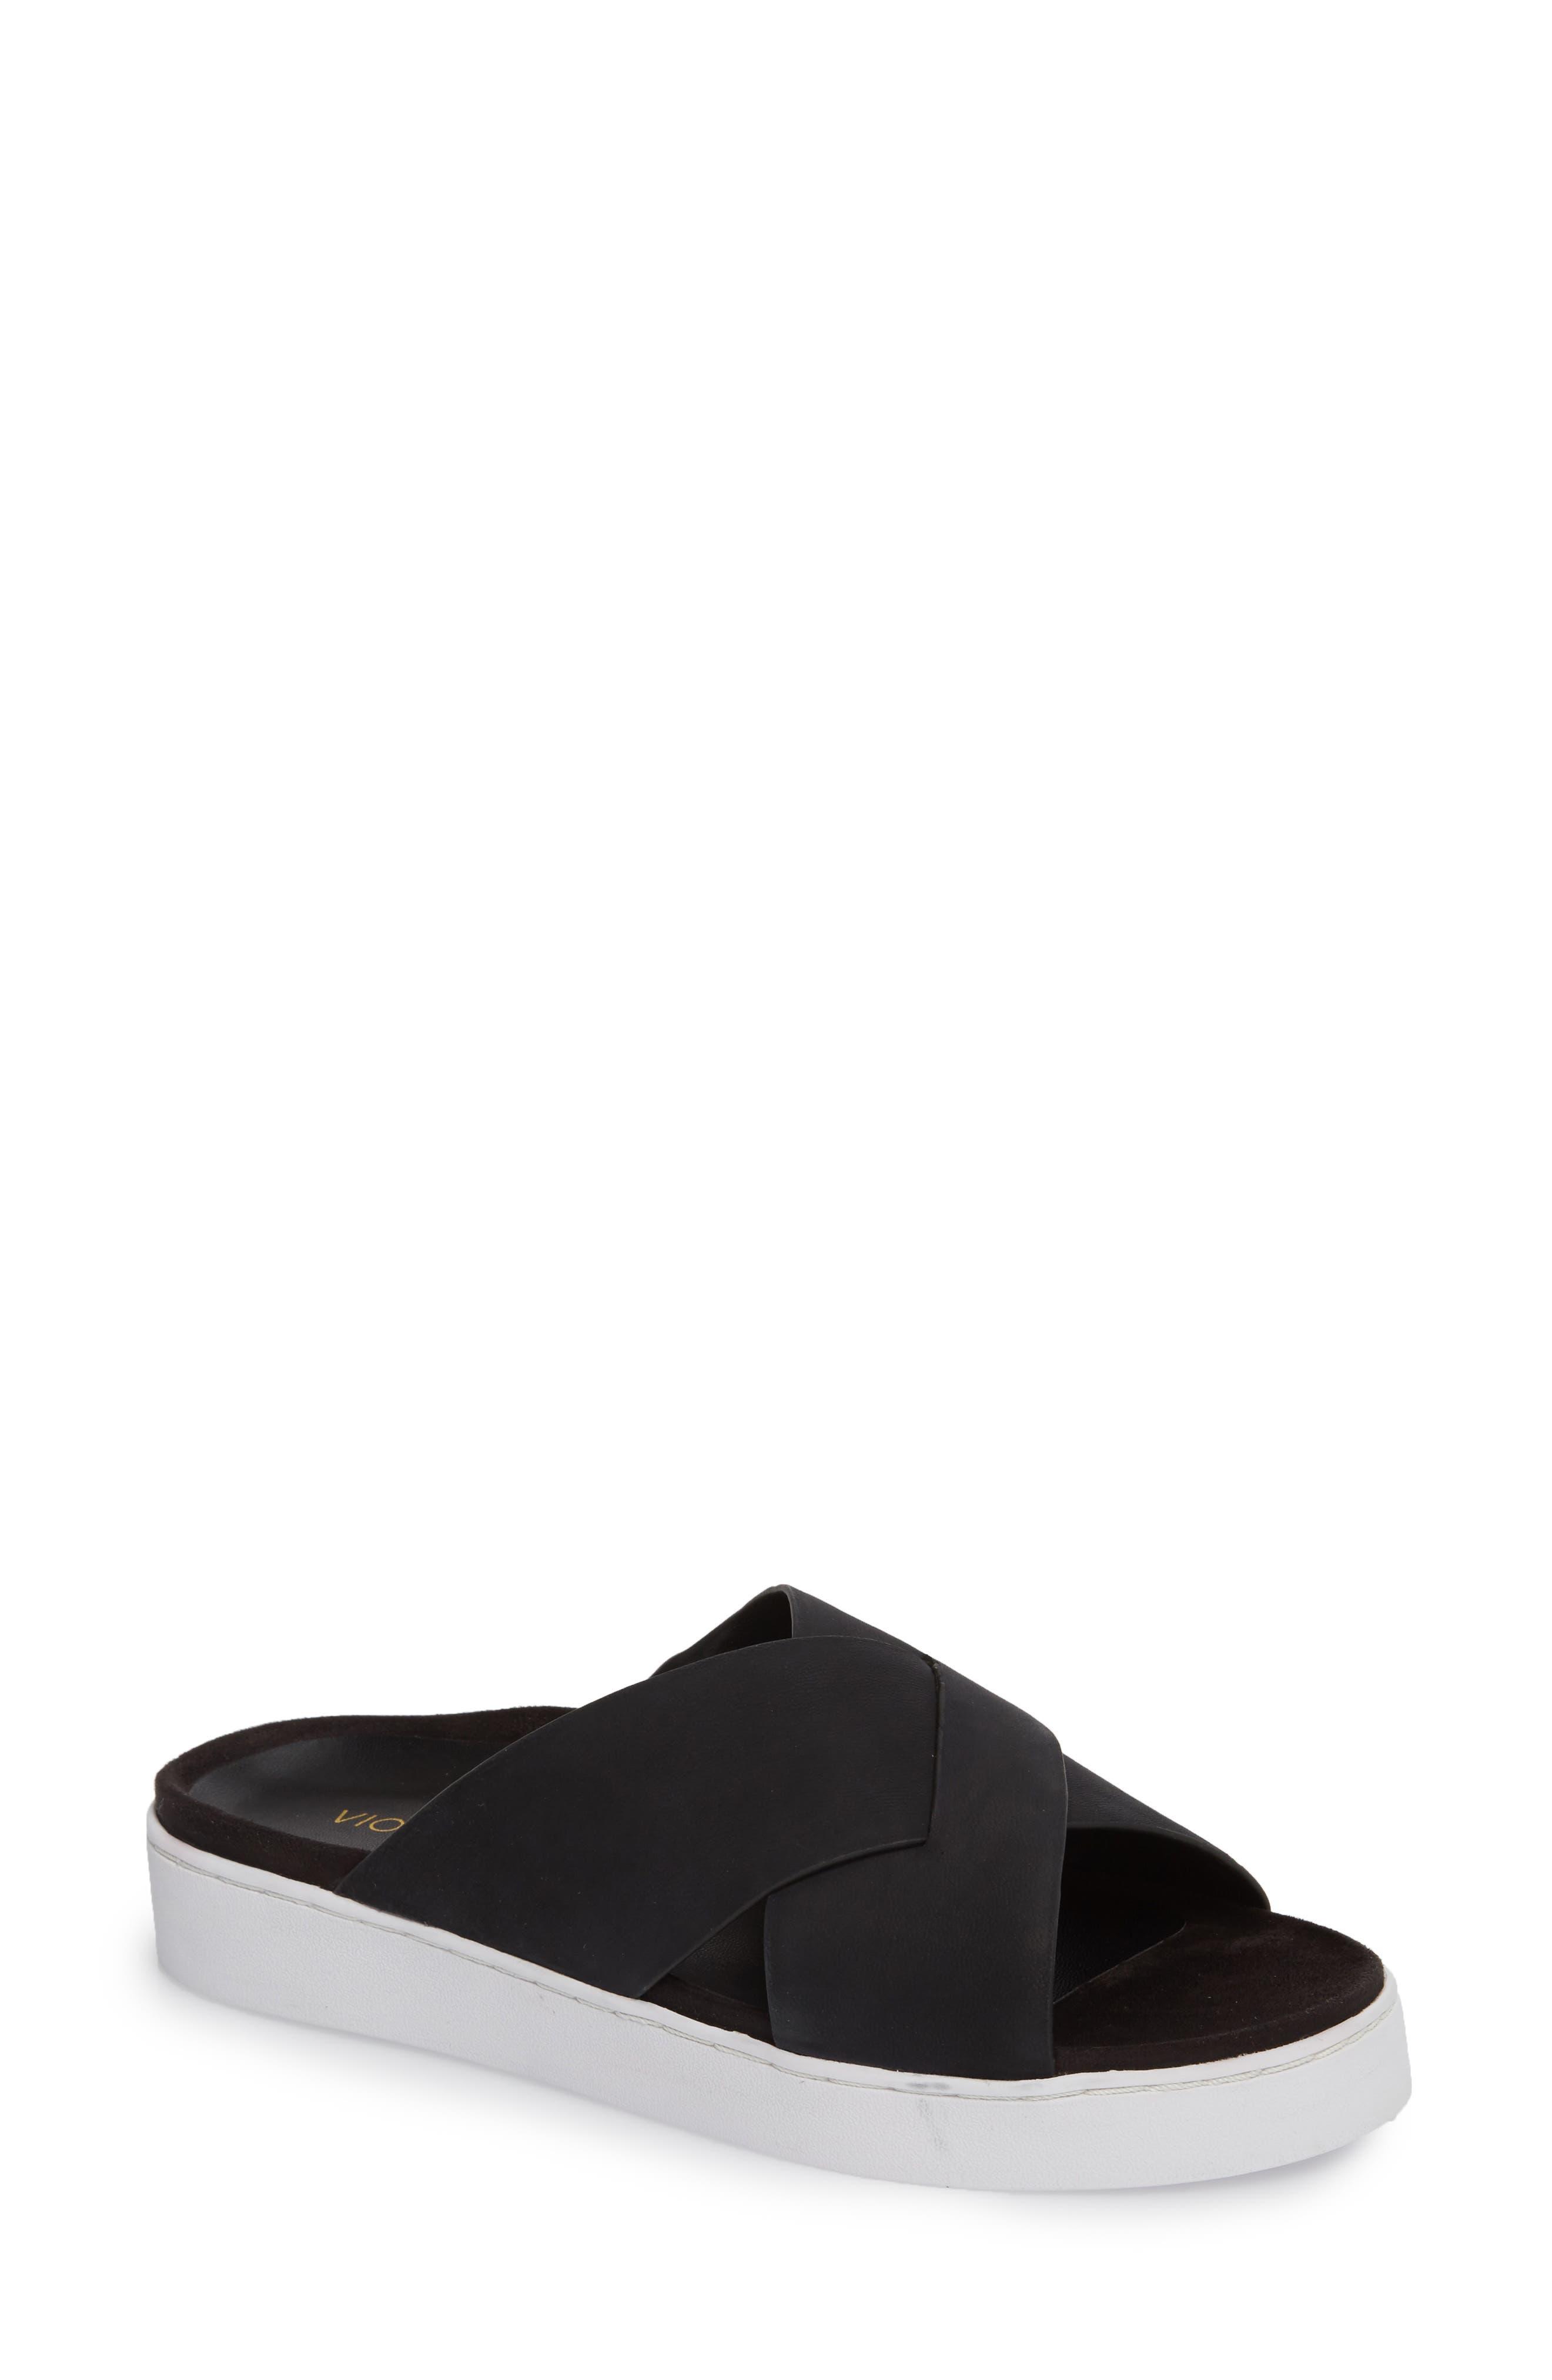 Lou Slide Sandal,                         Main,                         color, 001